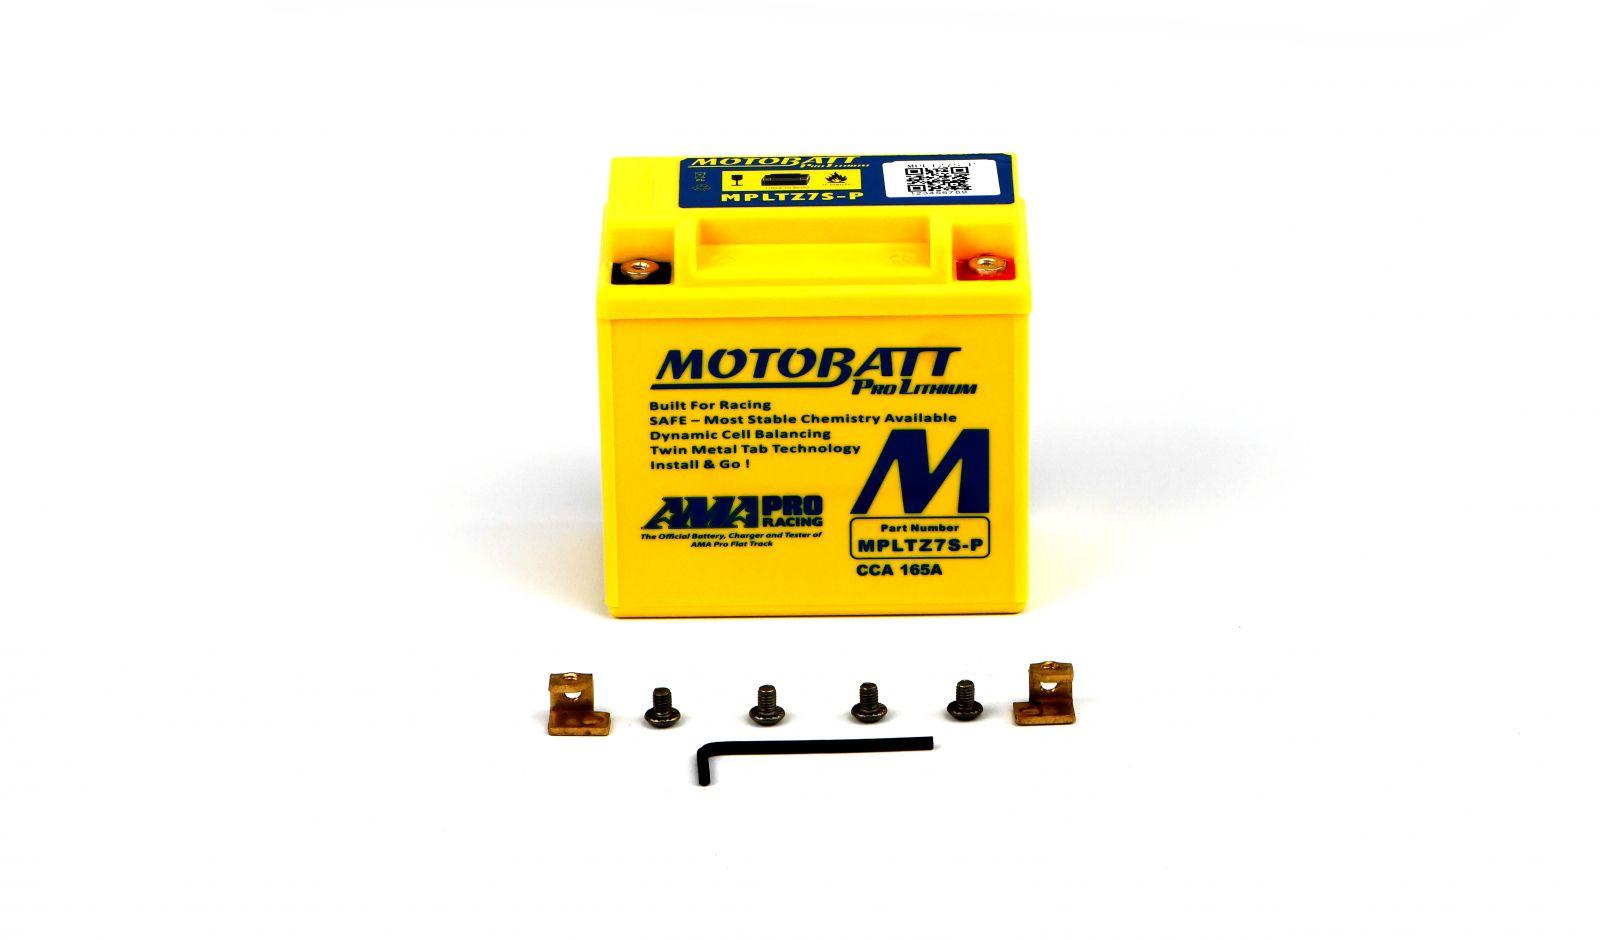 Motobatt Lithium Batteries - 501079ML image